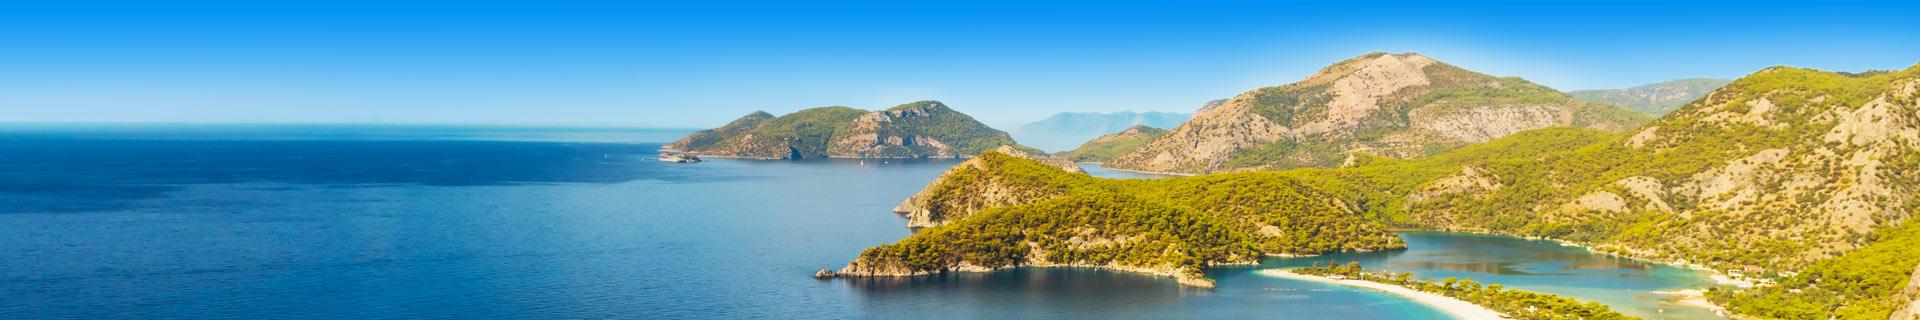 uitzicht turkije